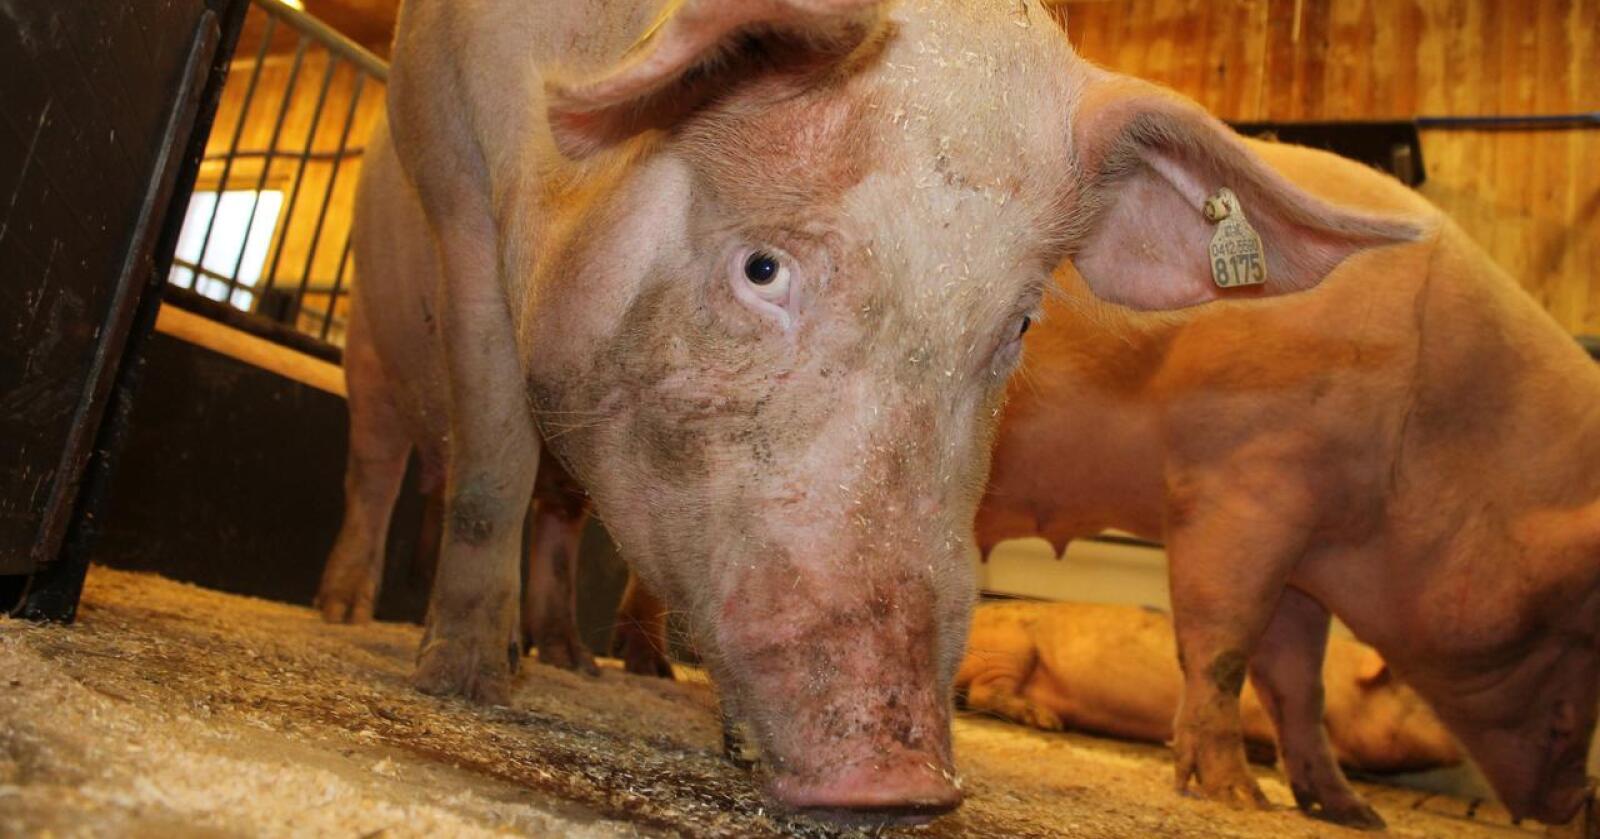 Som svinebonde er jeg glad for at mange bryr seg om hvordan dyra har det, skriver svinebonde Solveig Utvik i Vestvågøy. (Foto: Marit Glærum)